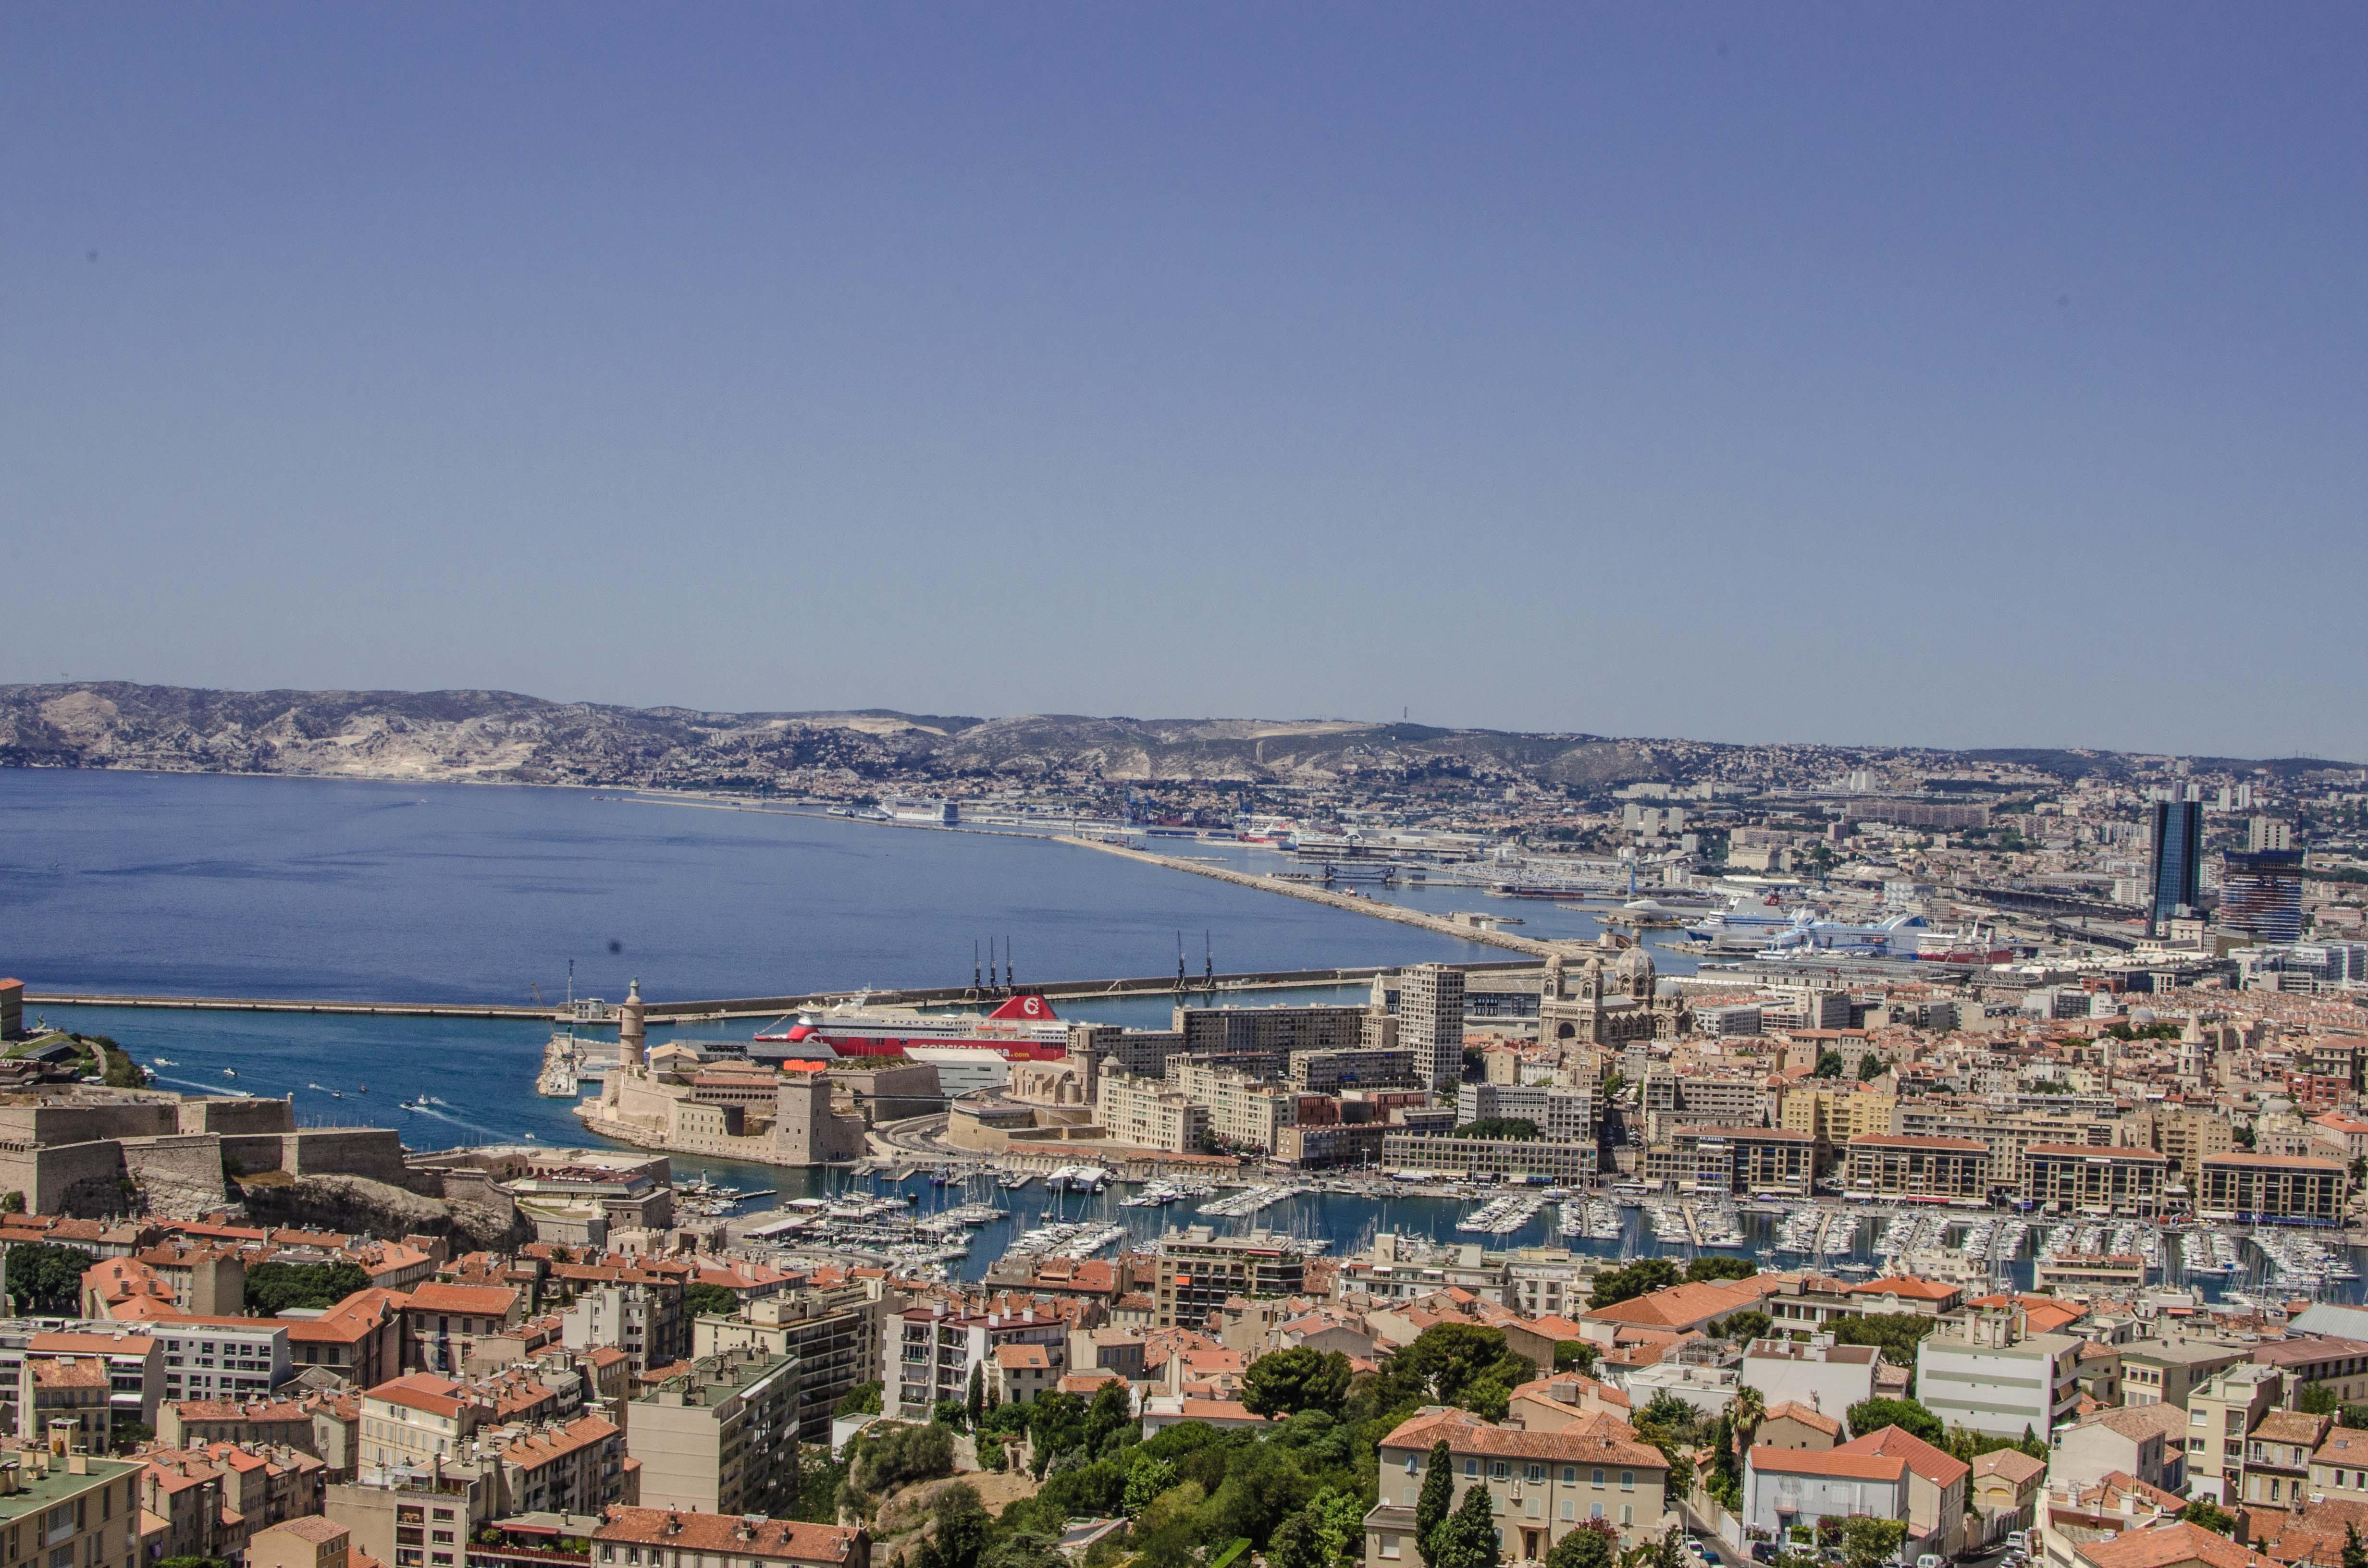 provenza40 Vacanze in Provenza, Camargue e Costa Azzurra